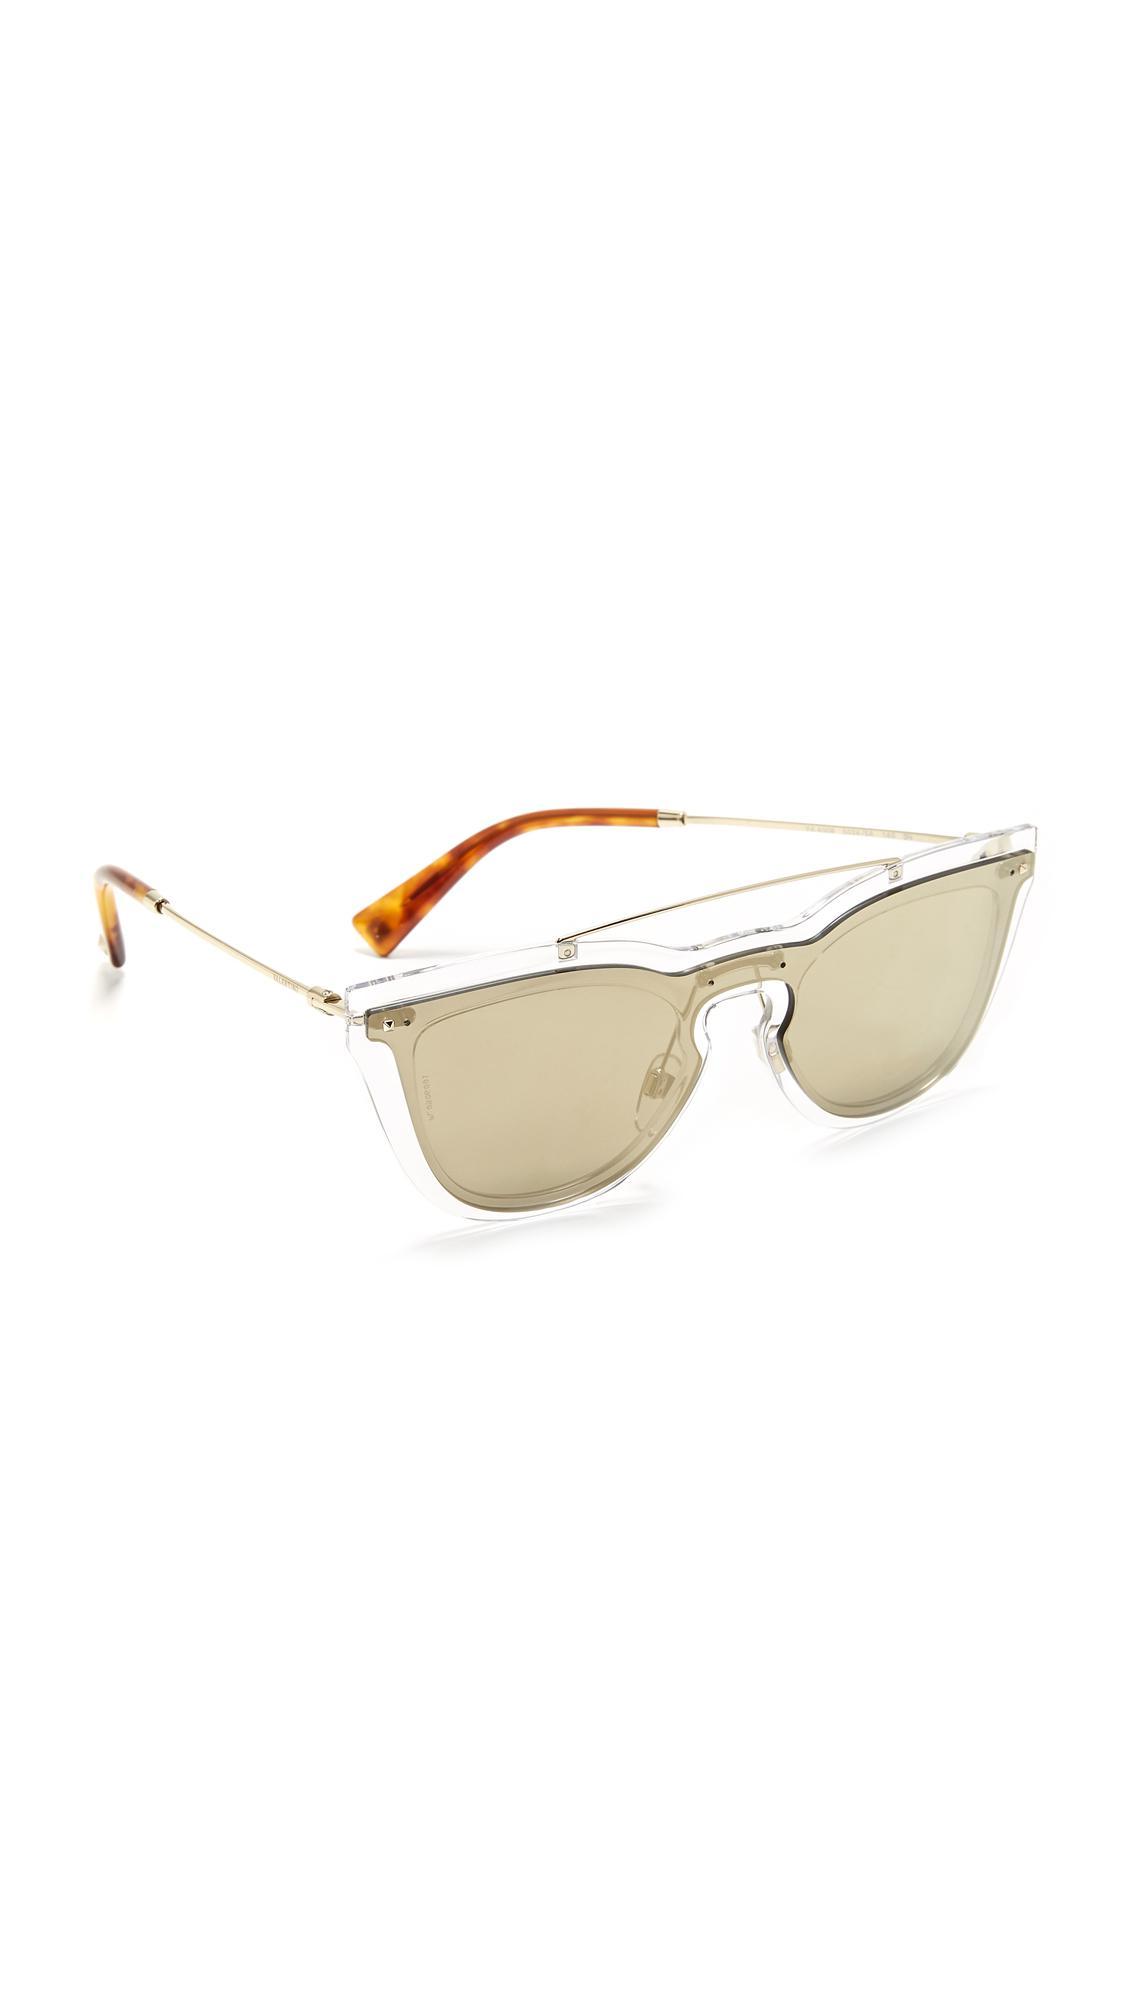 88cb12117448 Lyst - Valentino Glamgloss Sunglasses in Metallic